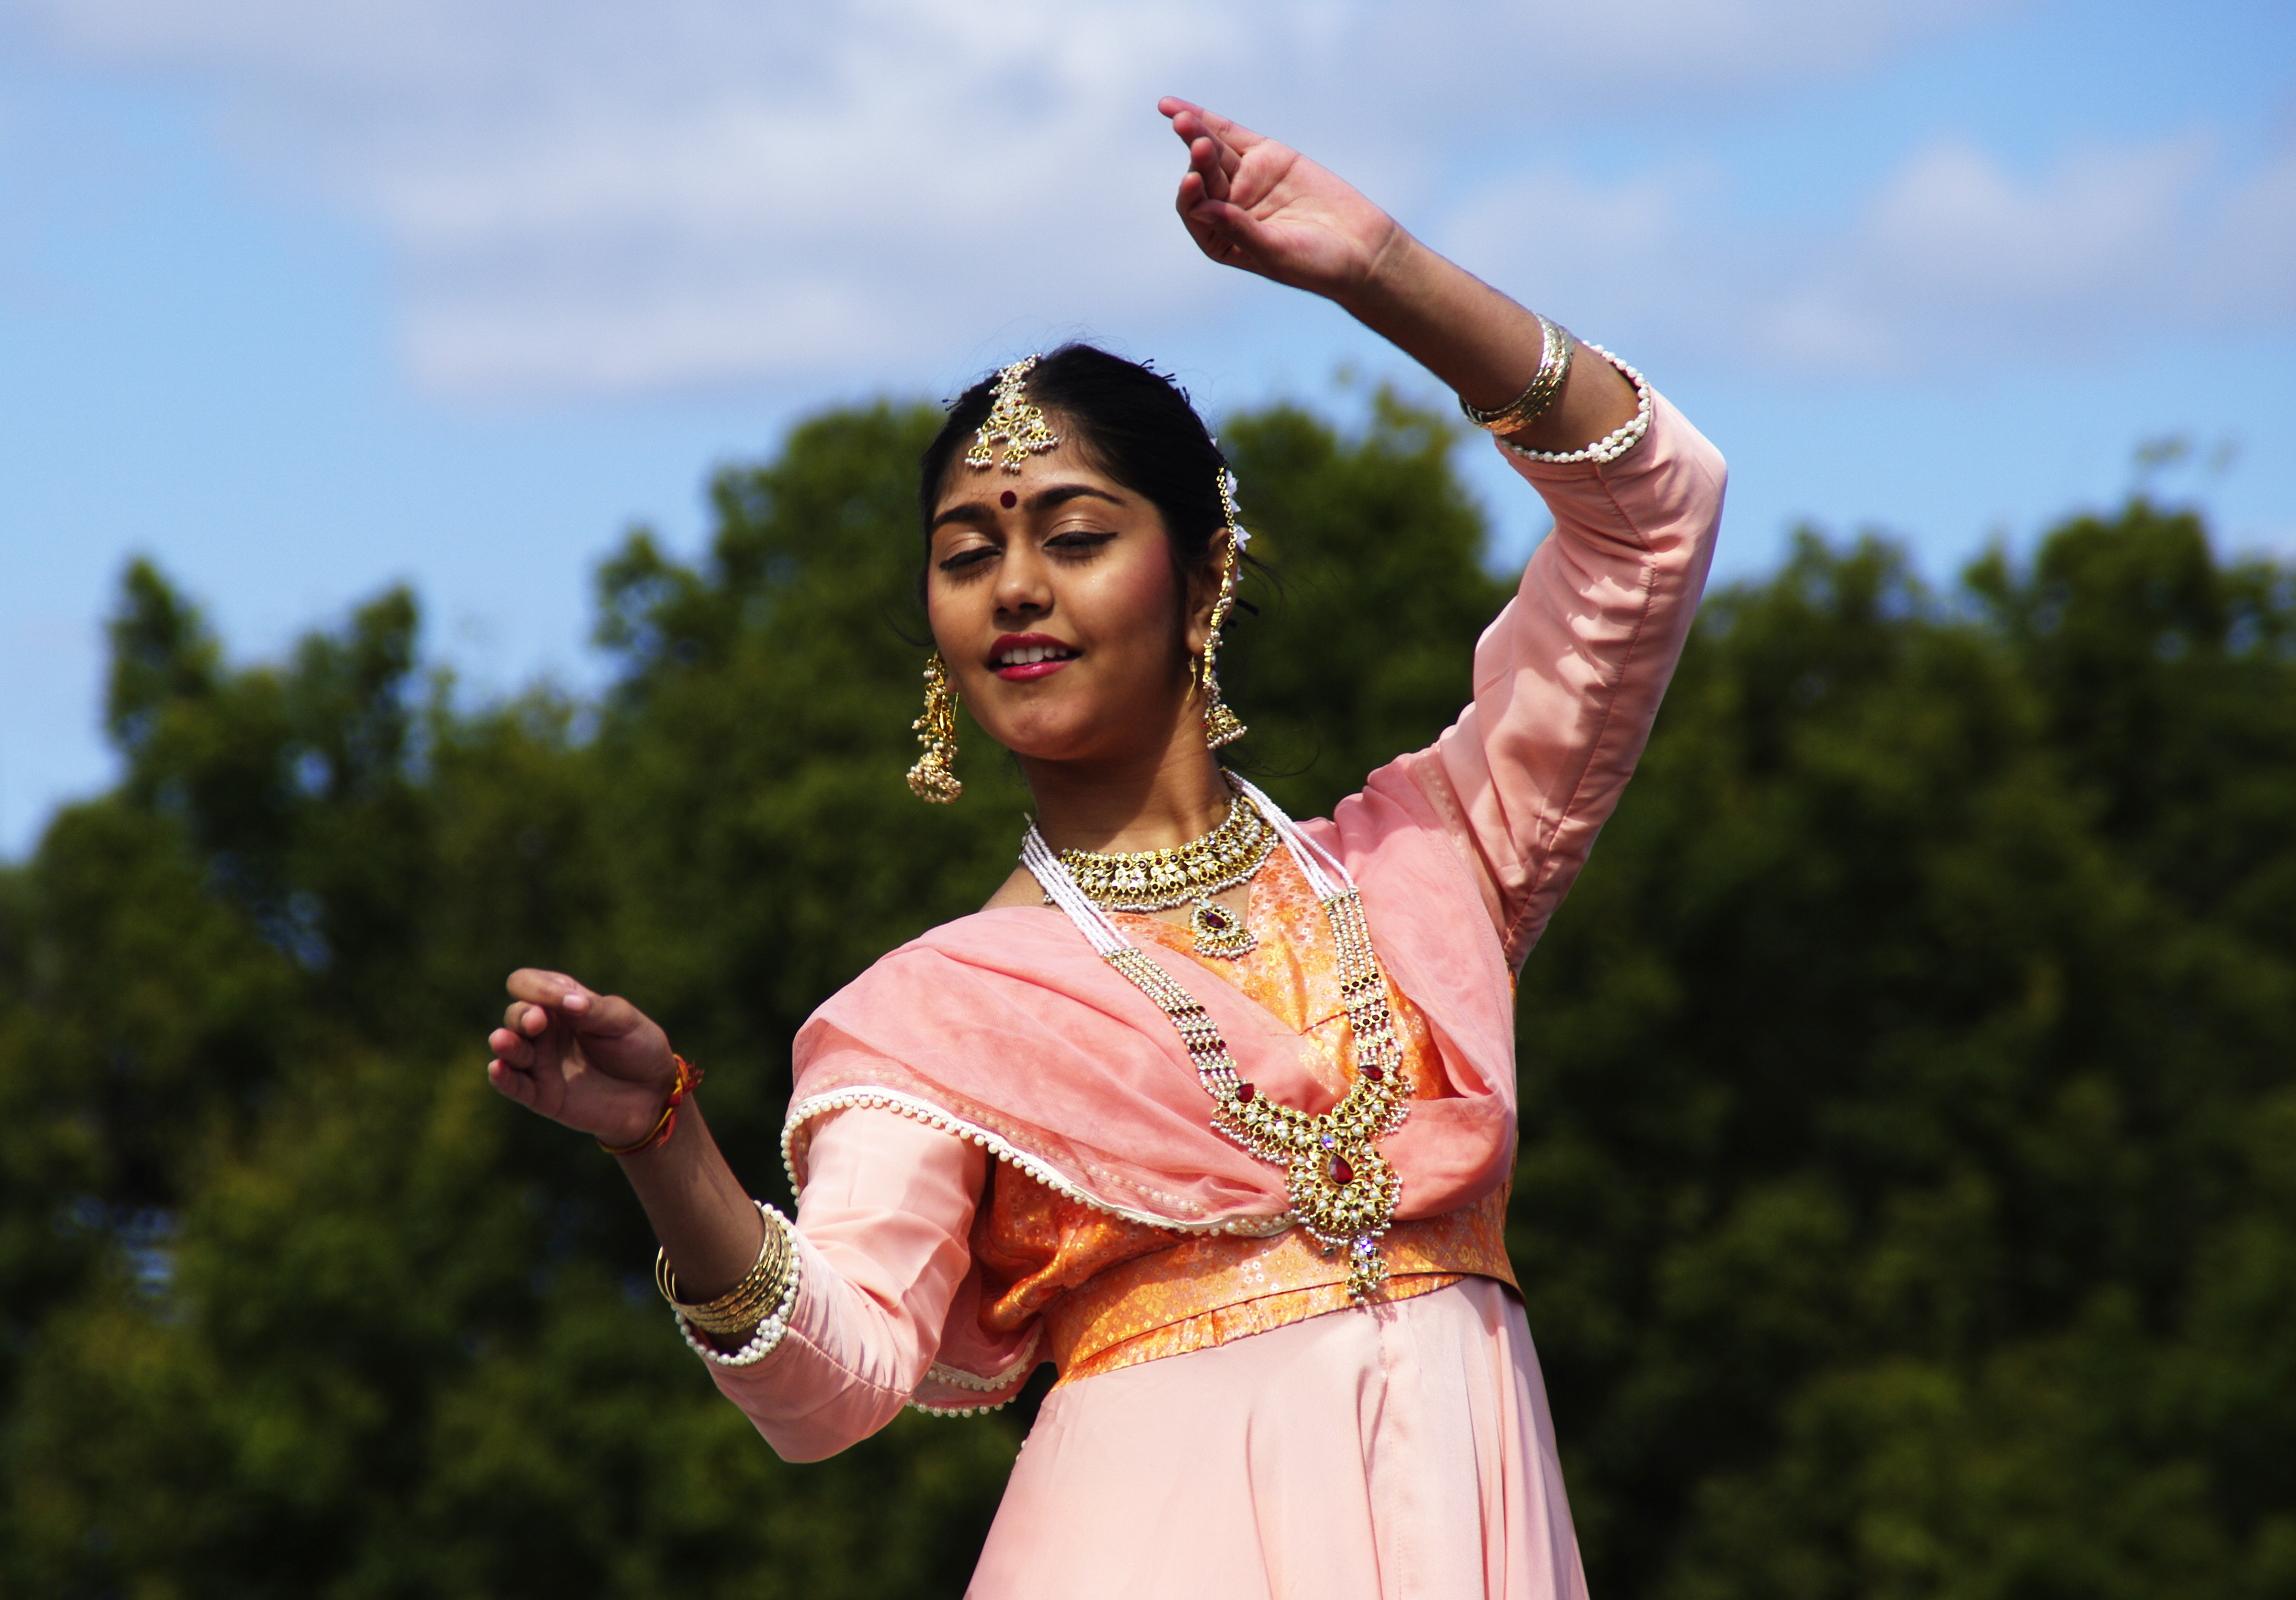 20-3 Indian Dancer flicker cco.jpg